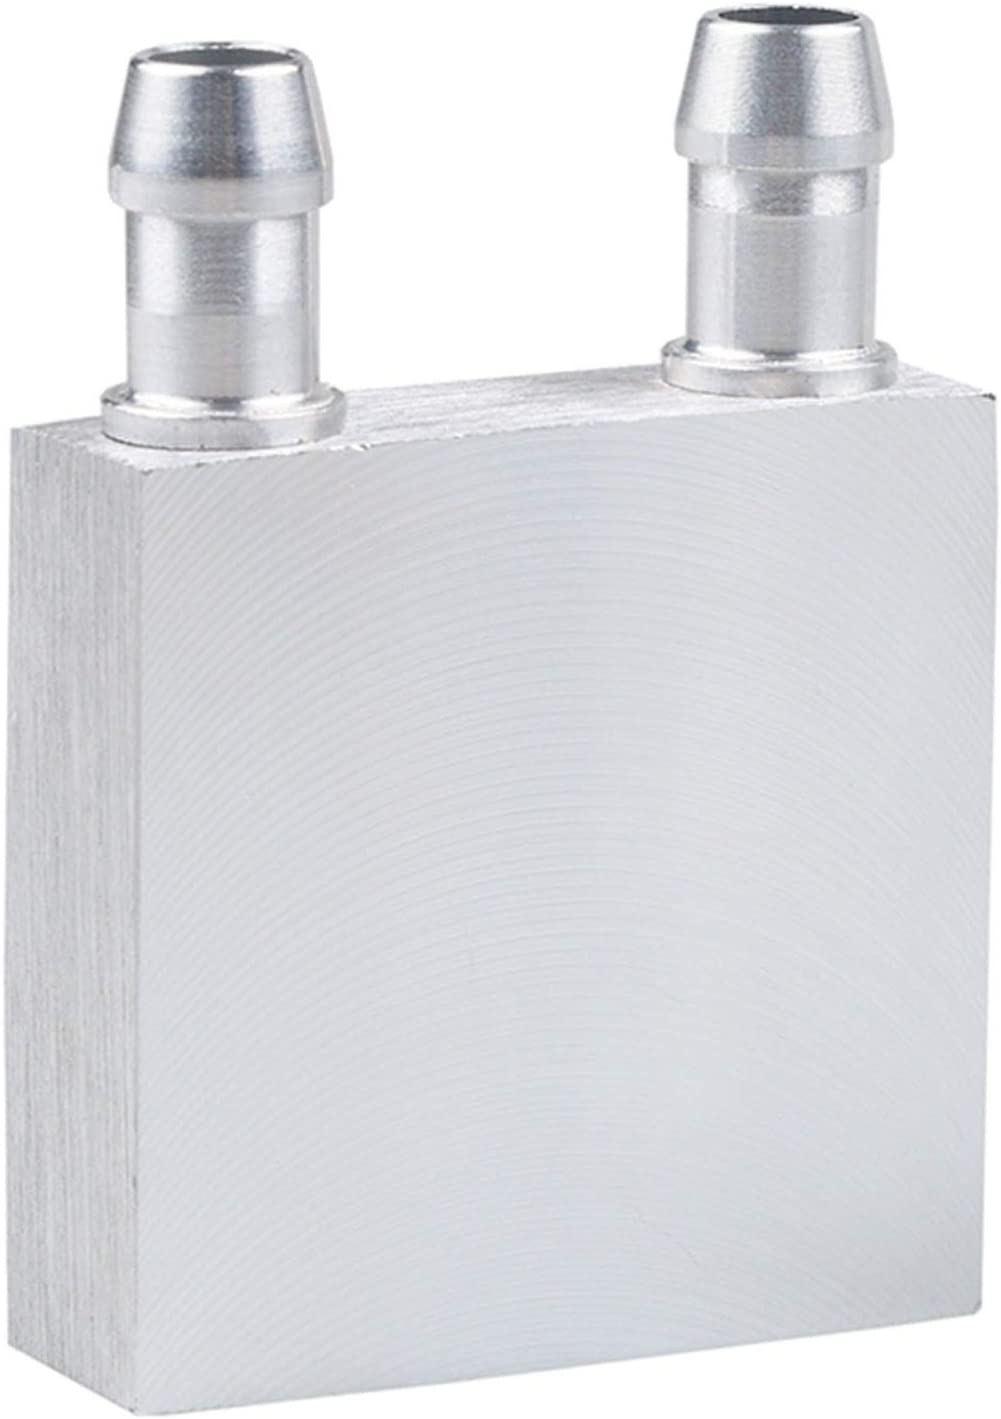 DGZZI Aluminum Water Cooling Block for CPU Graphics Radiator Heat Sink 40 x 40x12mm Liquid Water Cooler